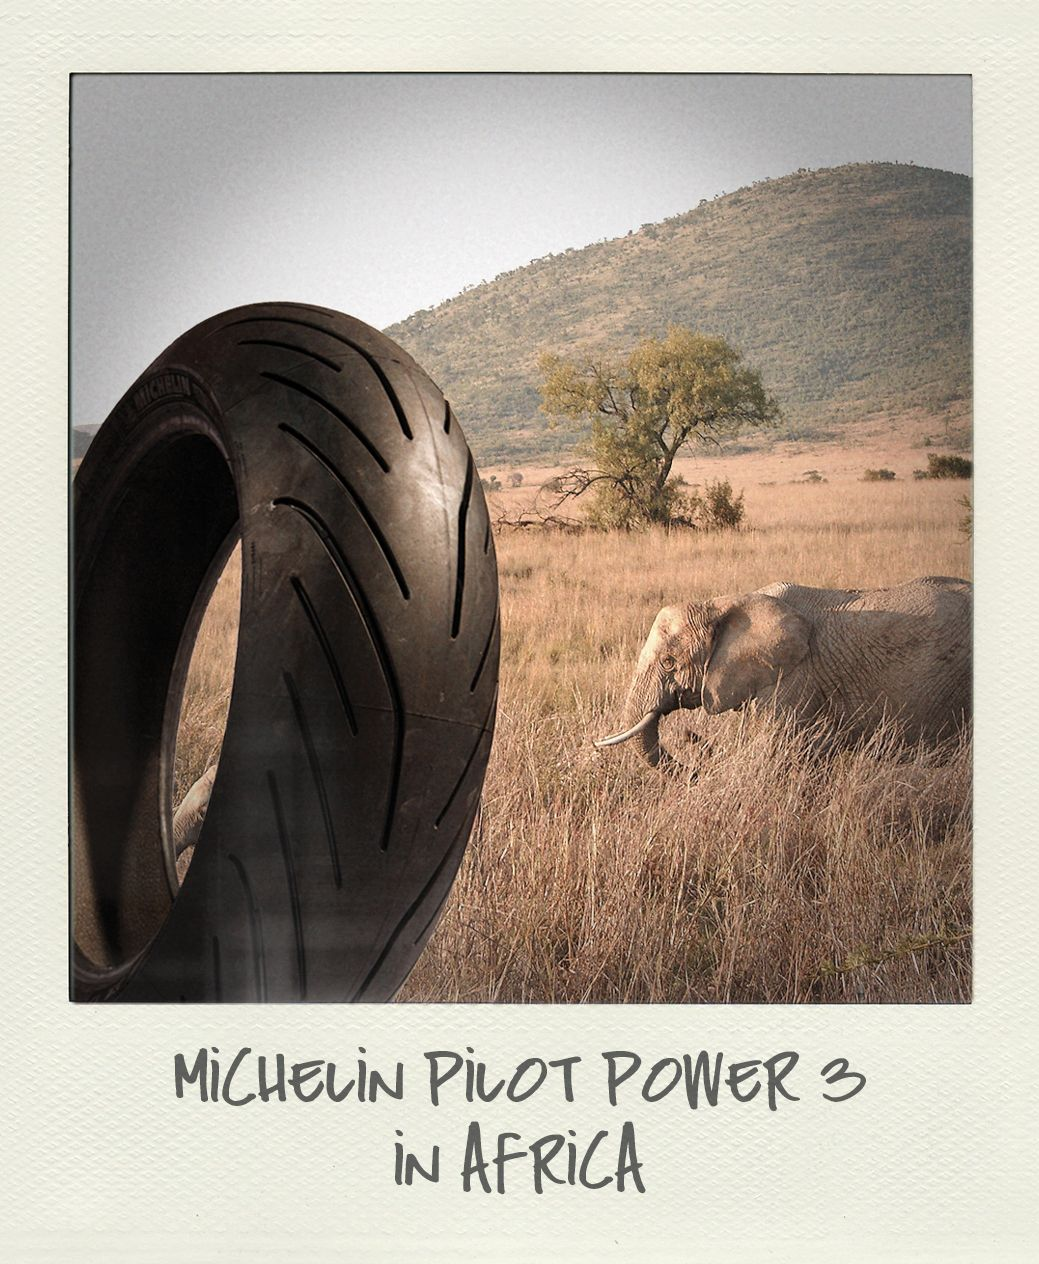 Michelin Pilot Power 3 In Africa Pneus